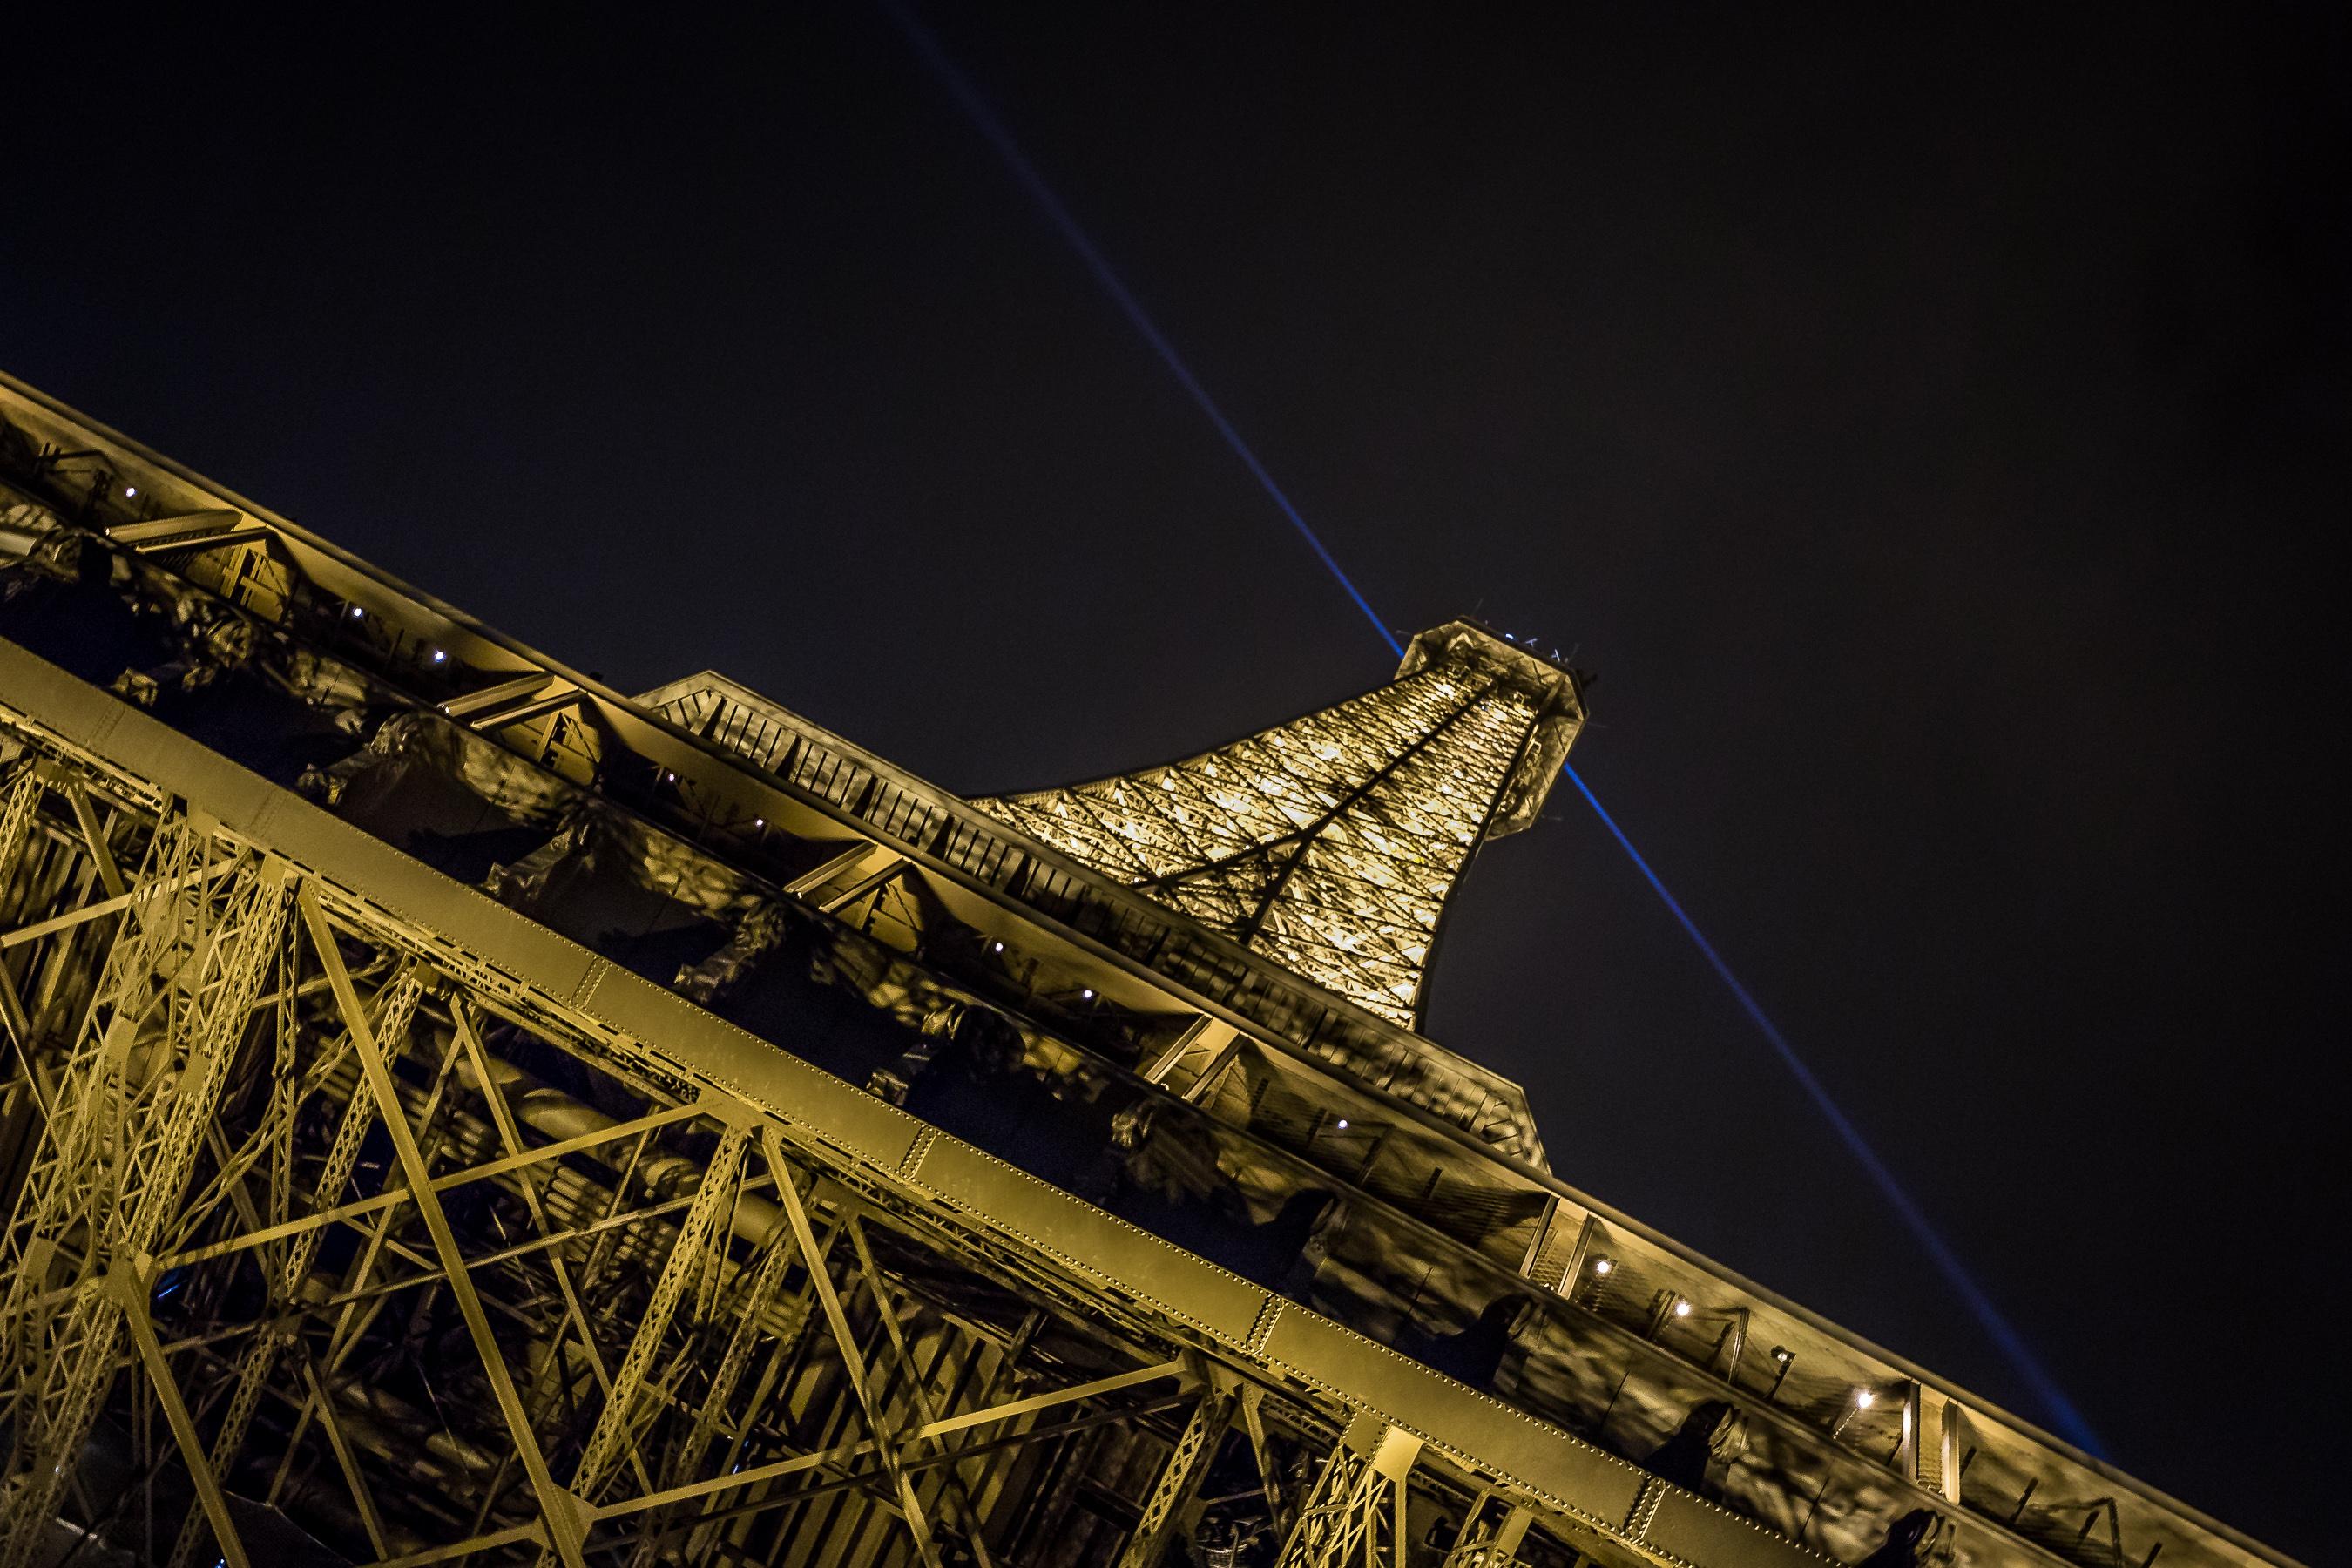 23 nights in paris propecia